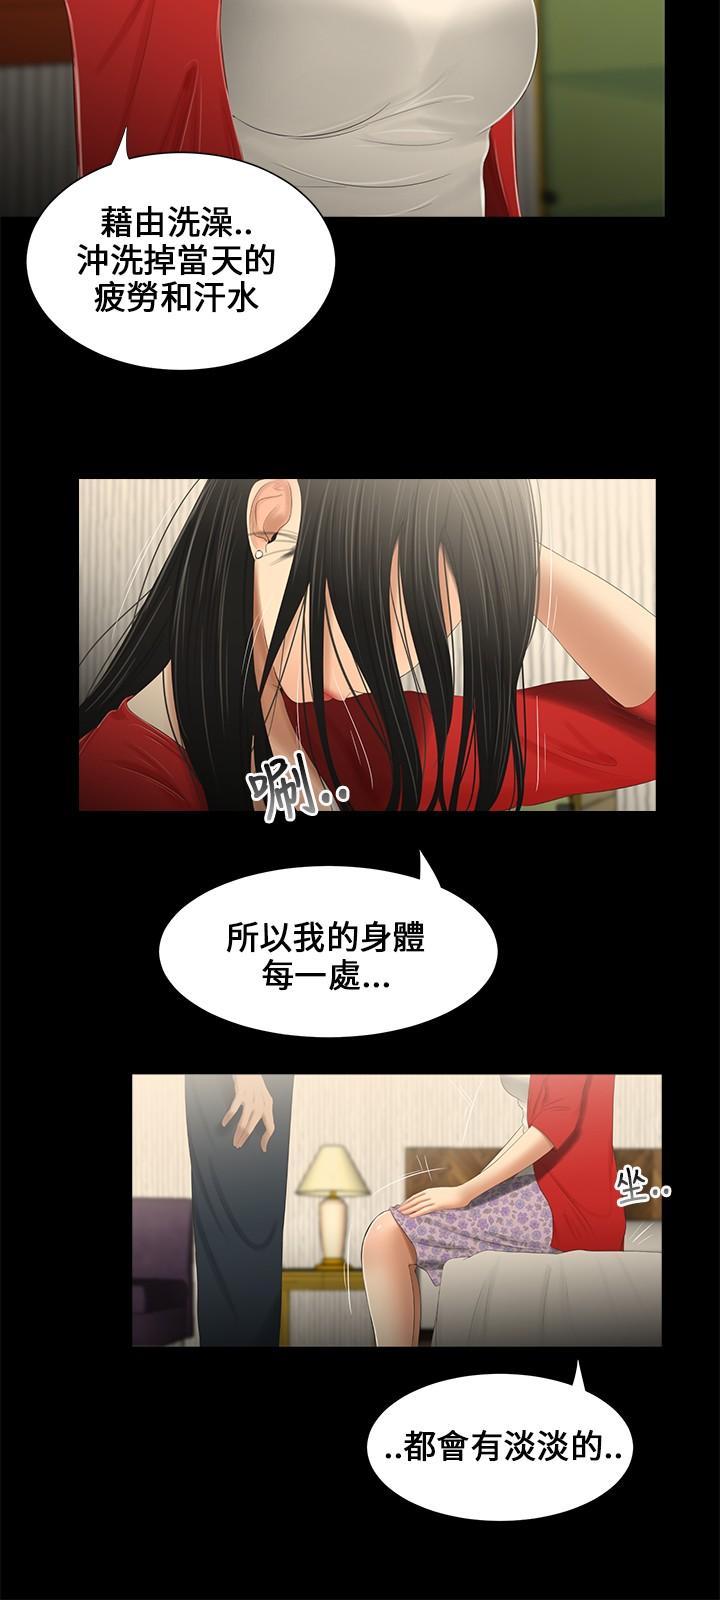 Three sisters 三姐妹Ch.13~19 (Chinese)中文 27